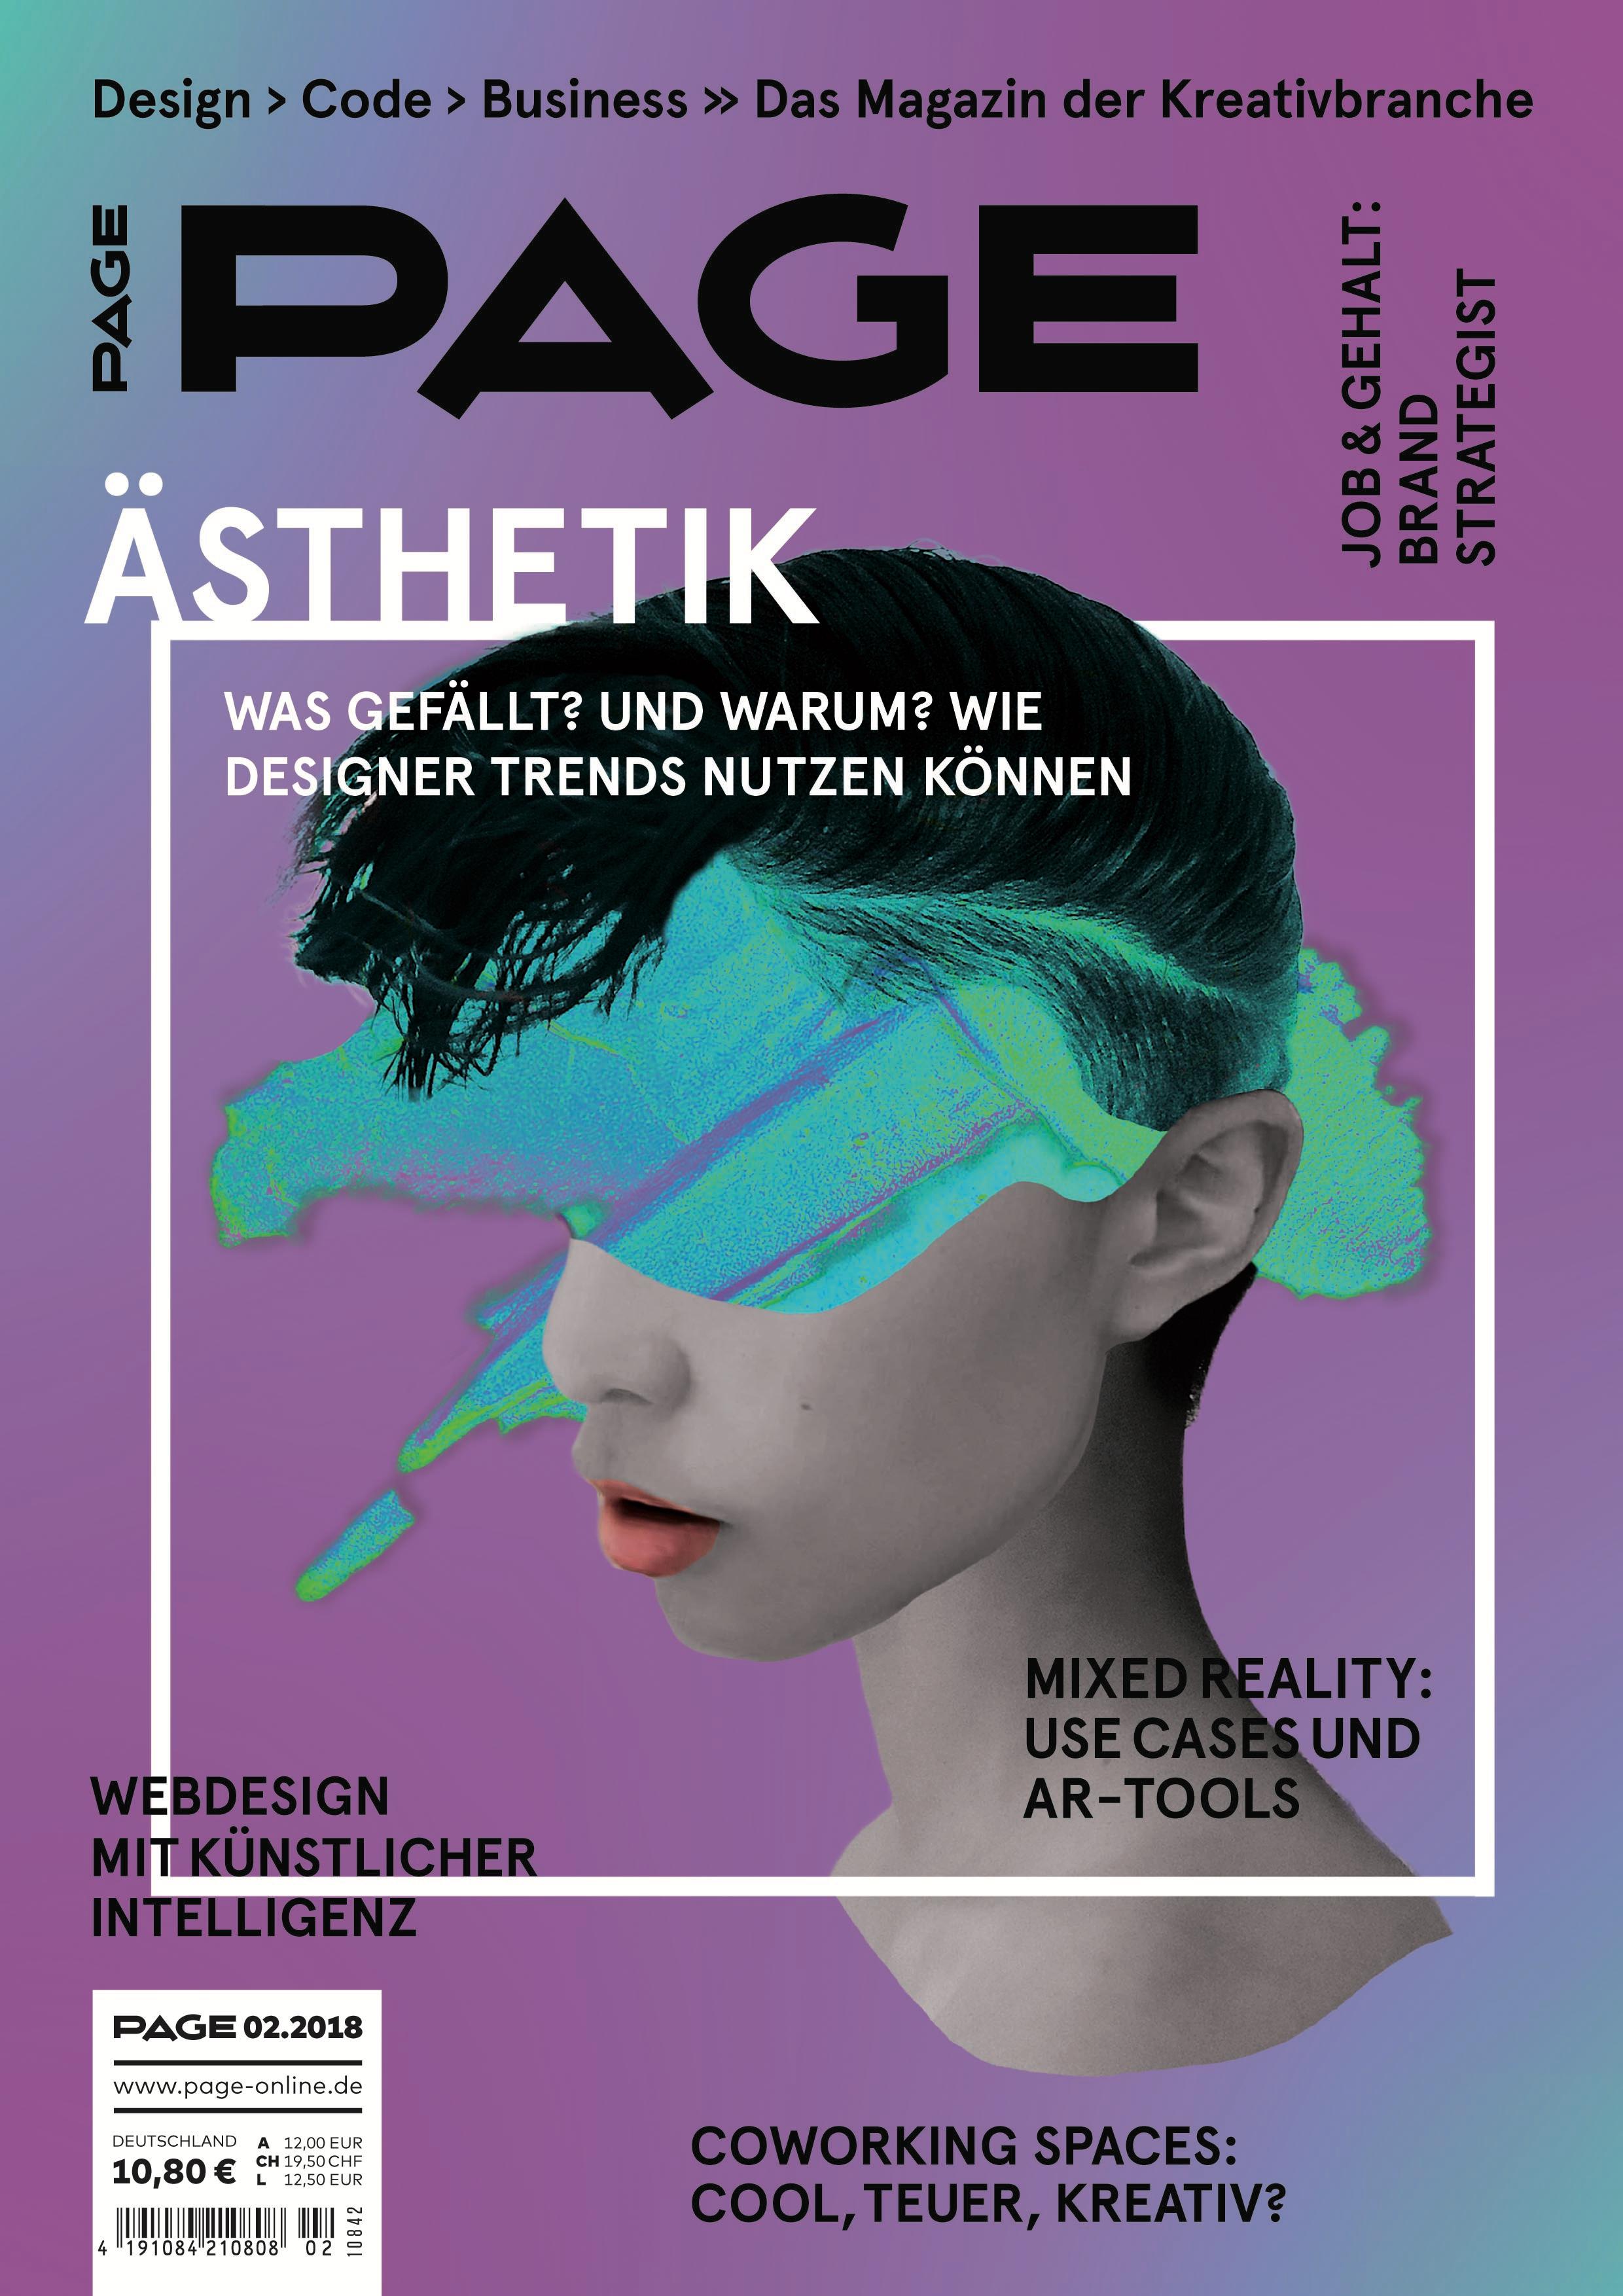 Kreativbranche, Design, Designer, Editorial Design, Ideenfindung, Print Design, Webdesign